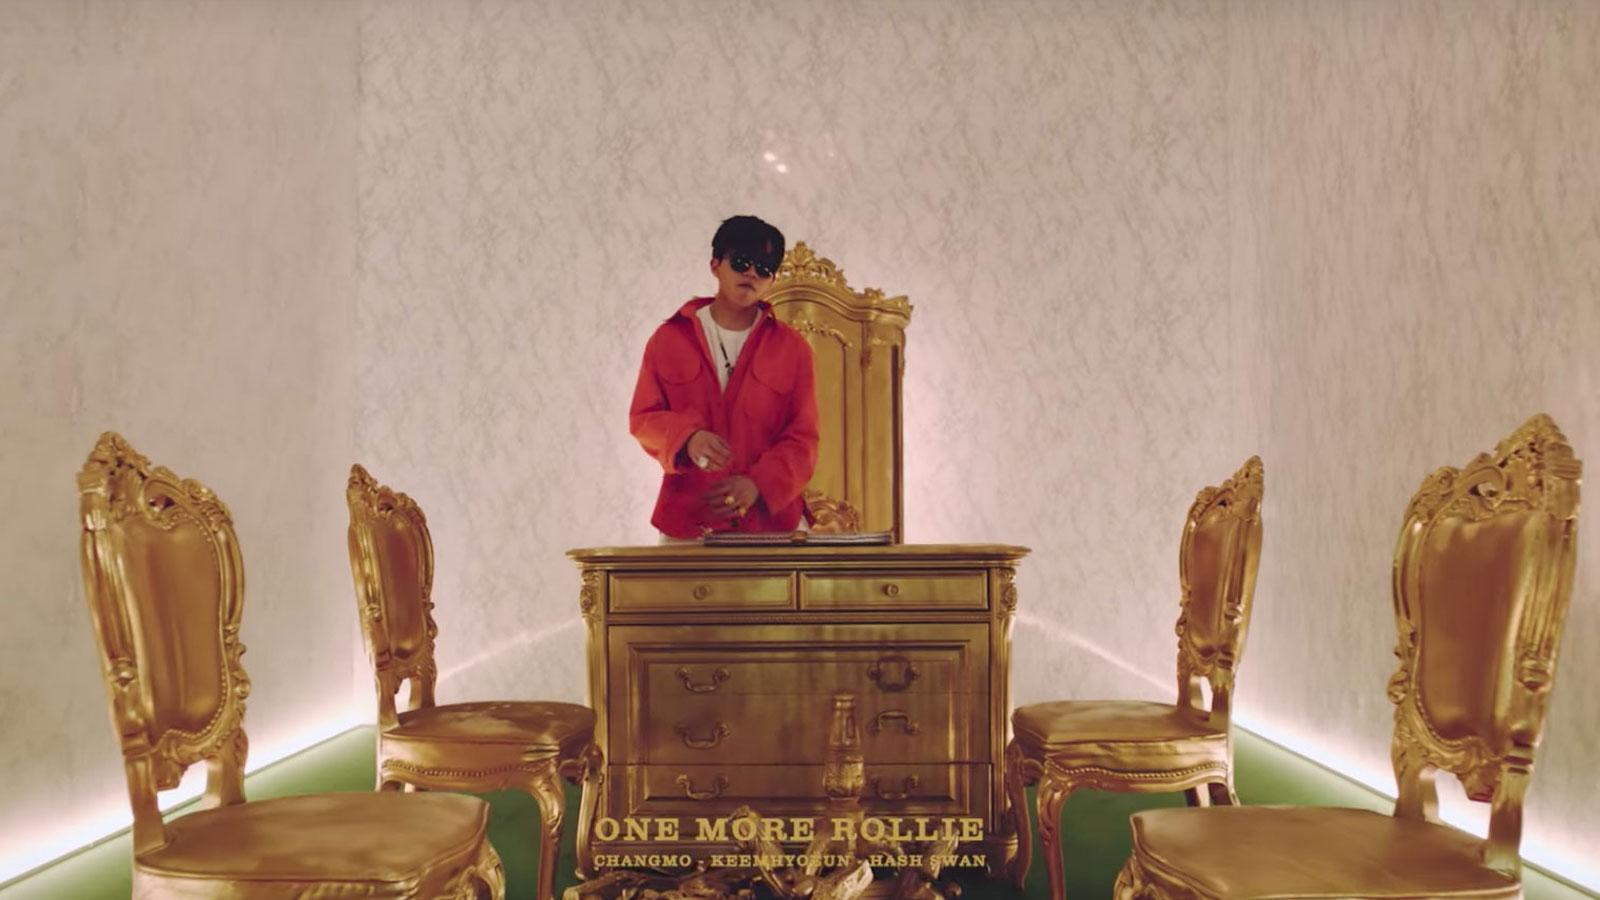 feat. Keem Hyo Eun & Hash Swan - changmo - one more rollie